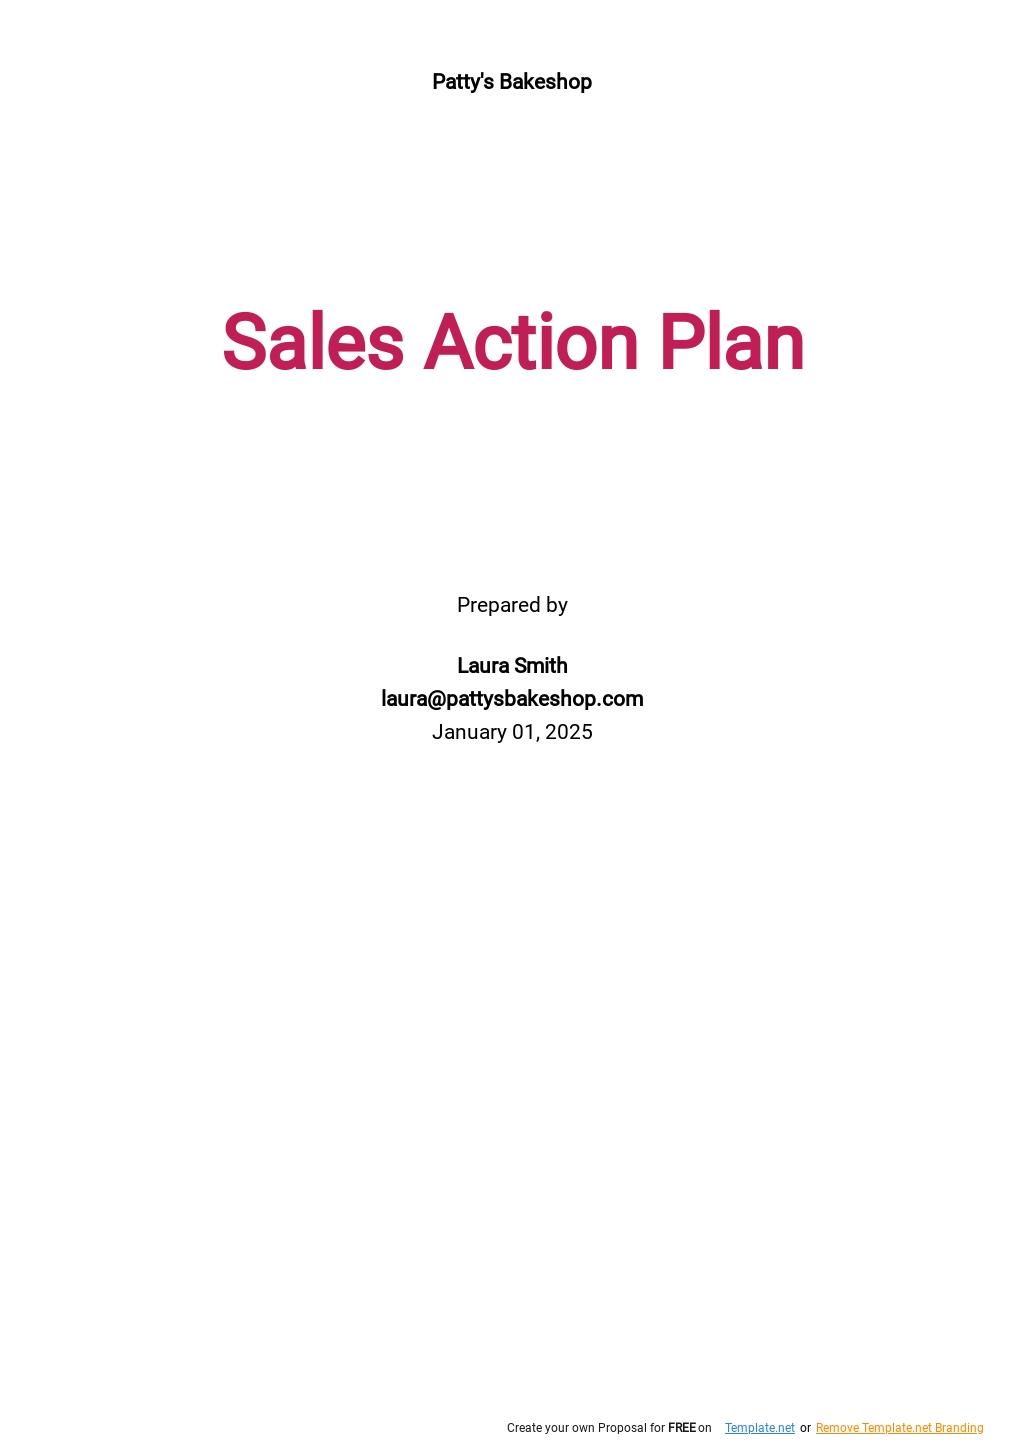 Sales Action Plan Template.jpe